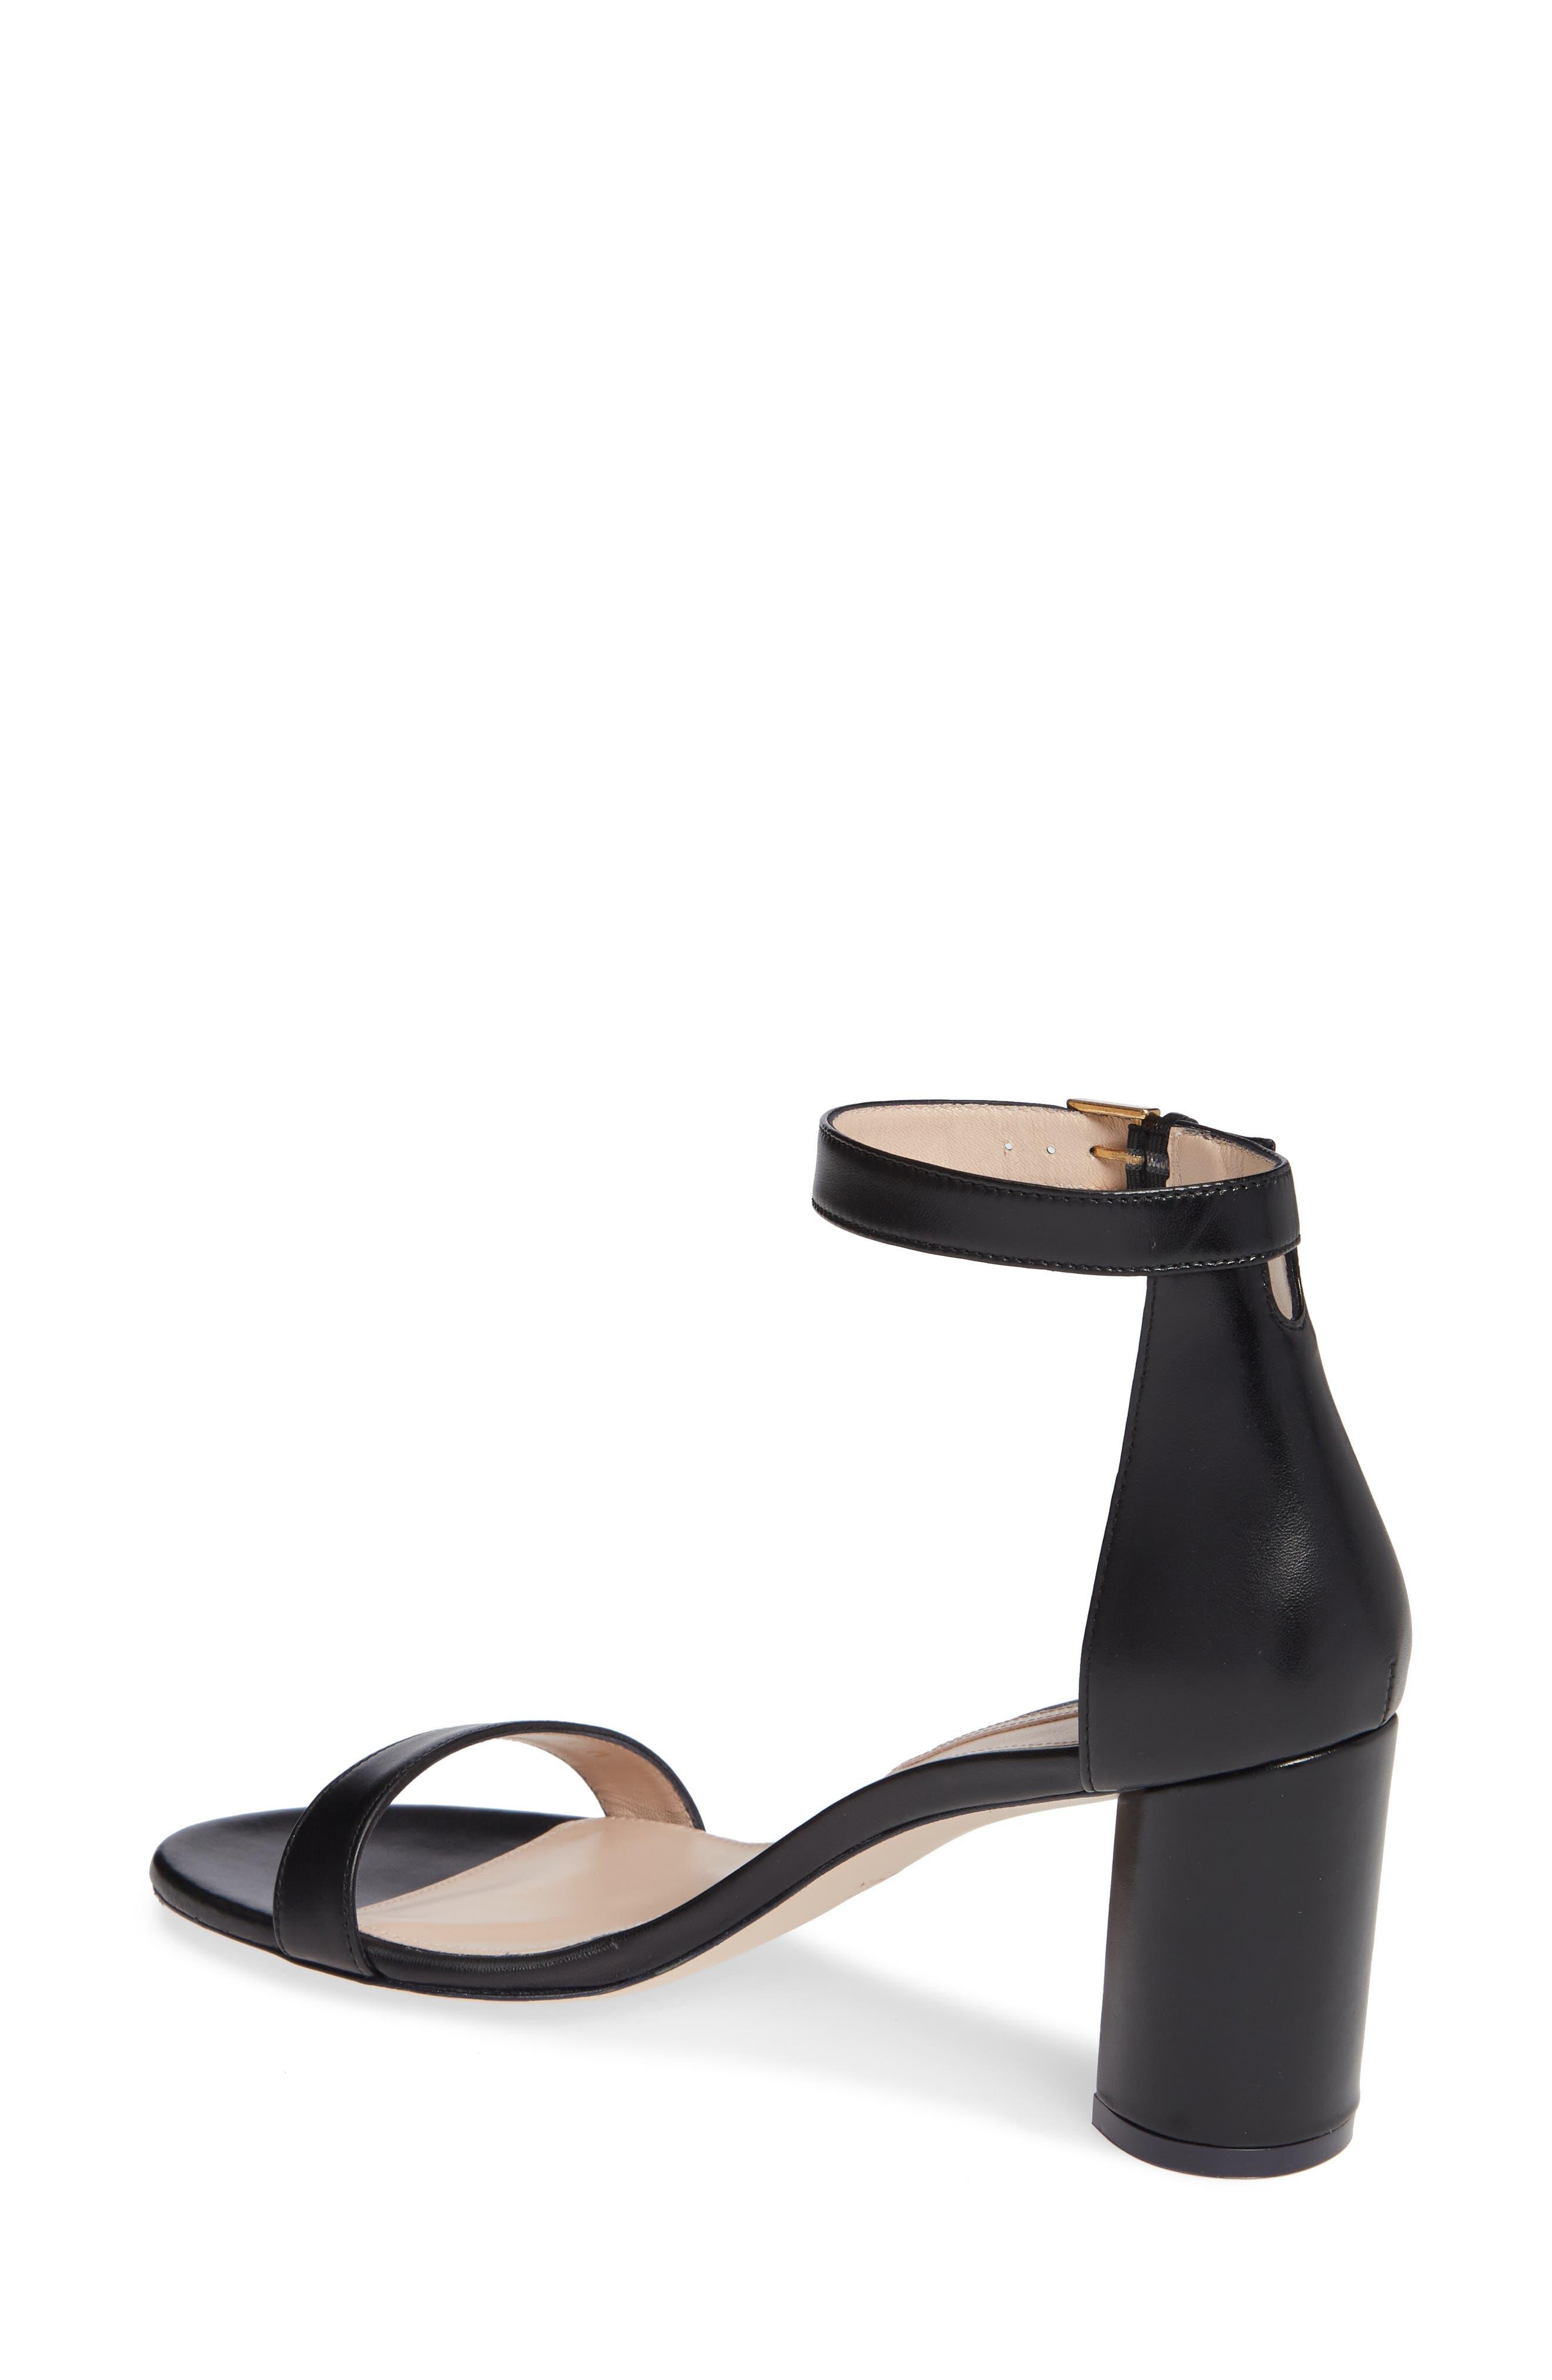 75LESSNUDIST Ankle Strap Sandal,                             Alternate thumbnail 2, color,                             BLACK NAPPA